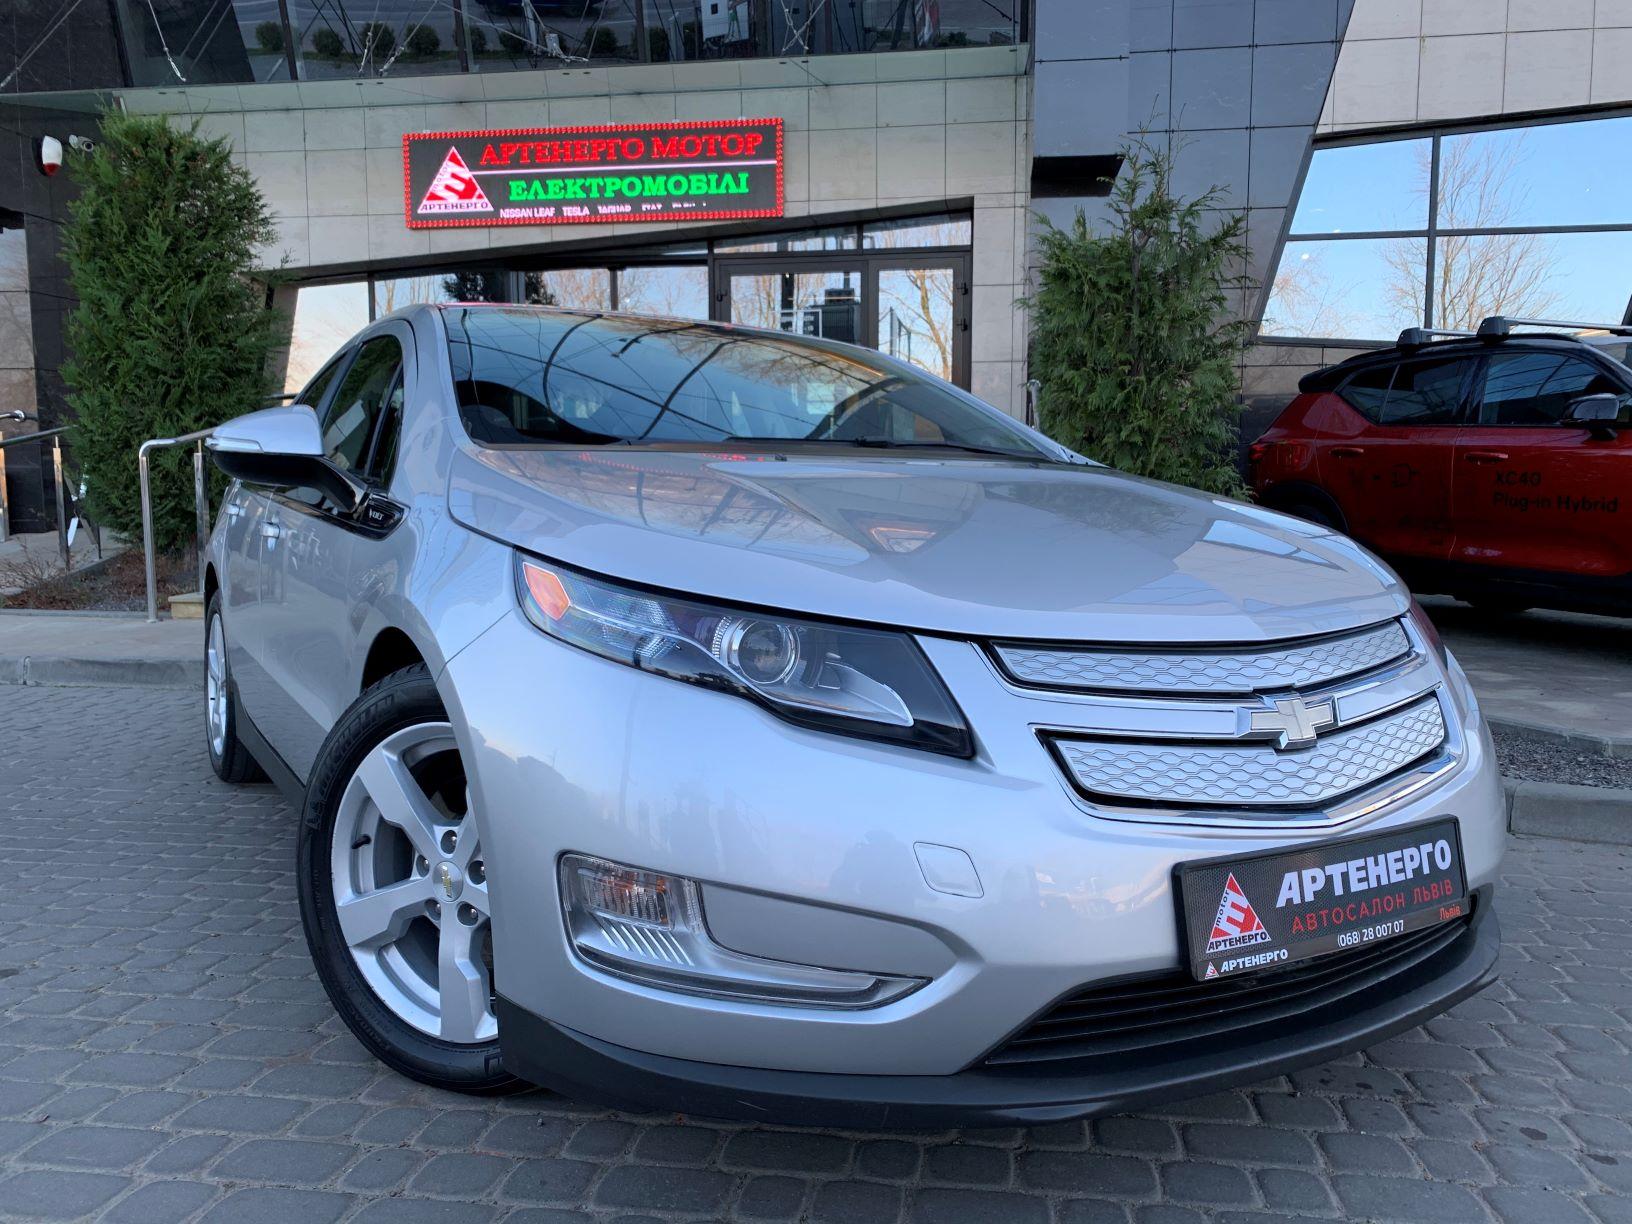 Chevrolet-Volt-artenergomotor